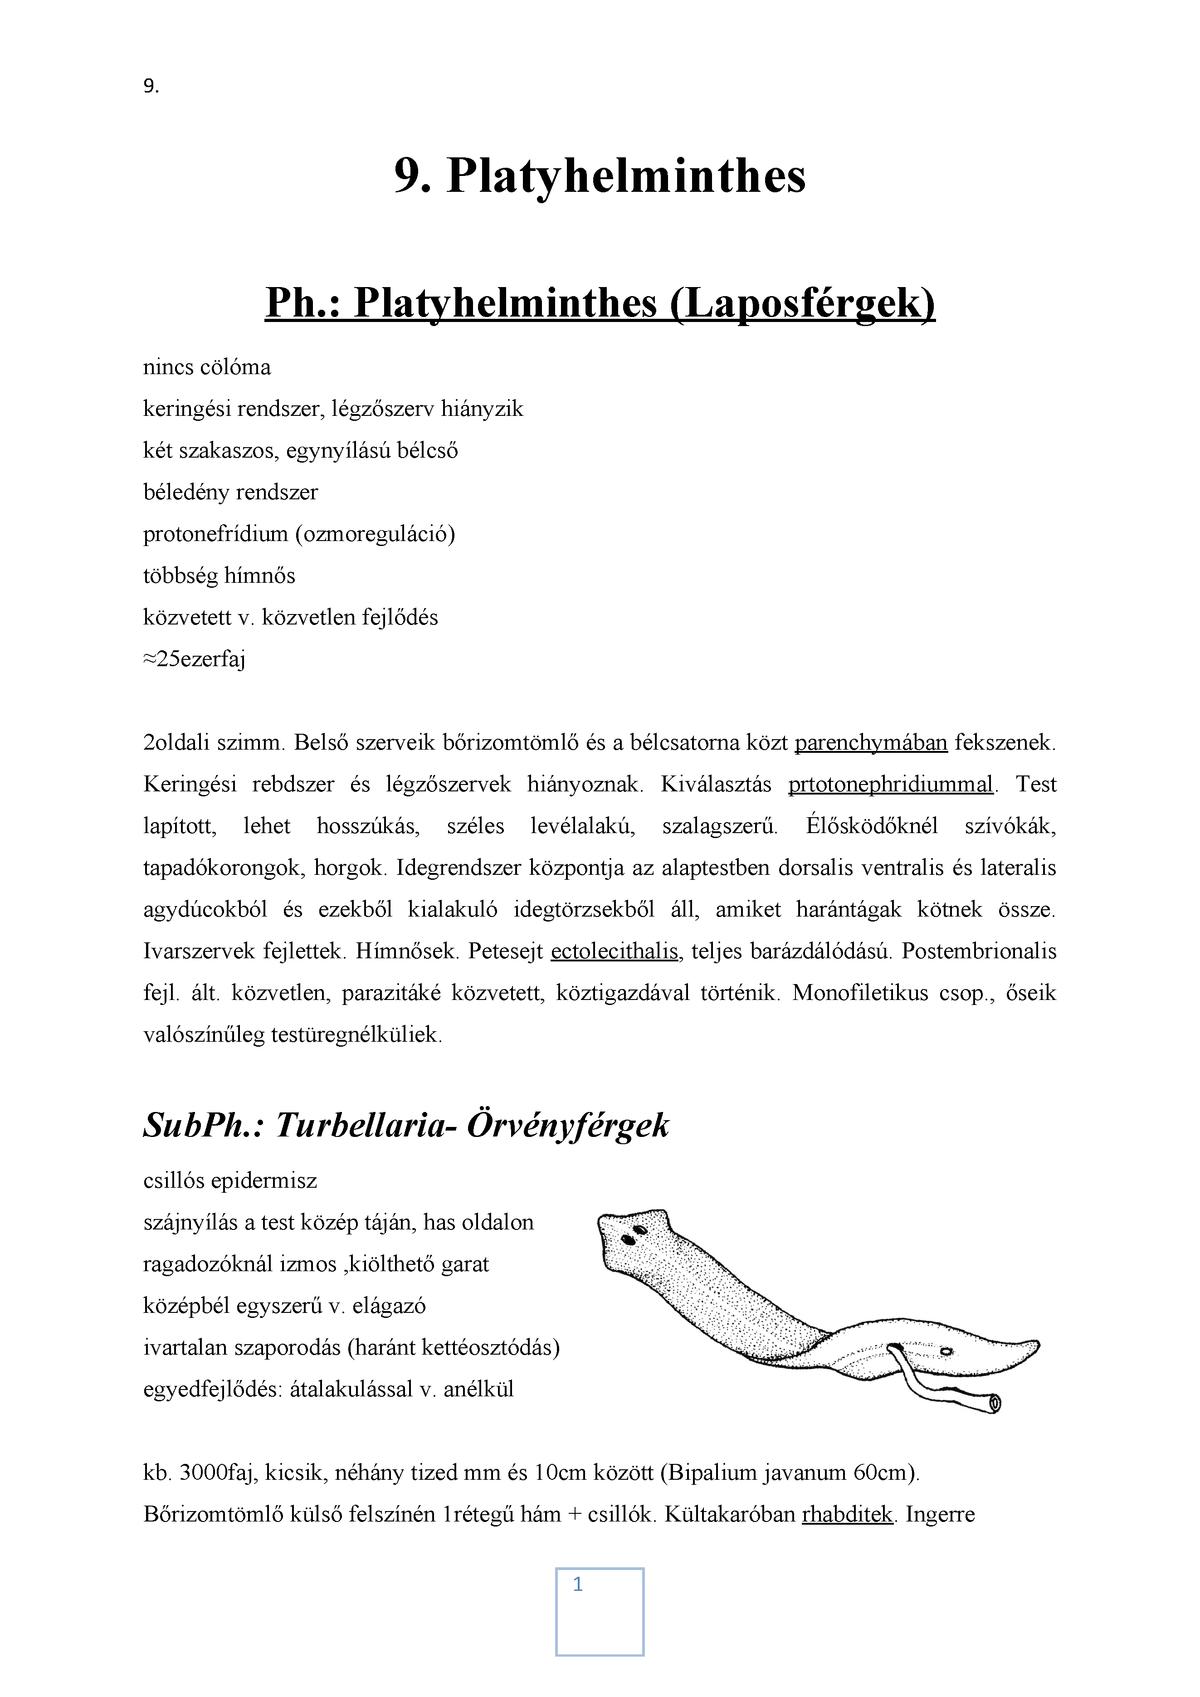 cryptosporidium and giardia duodenalis dr Clark zapper paraziták